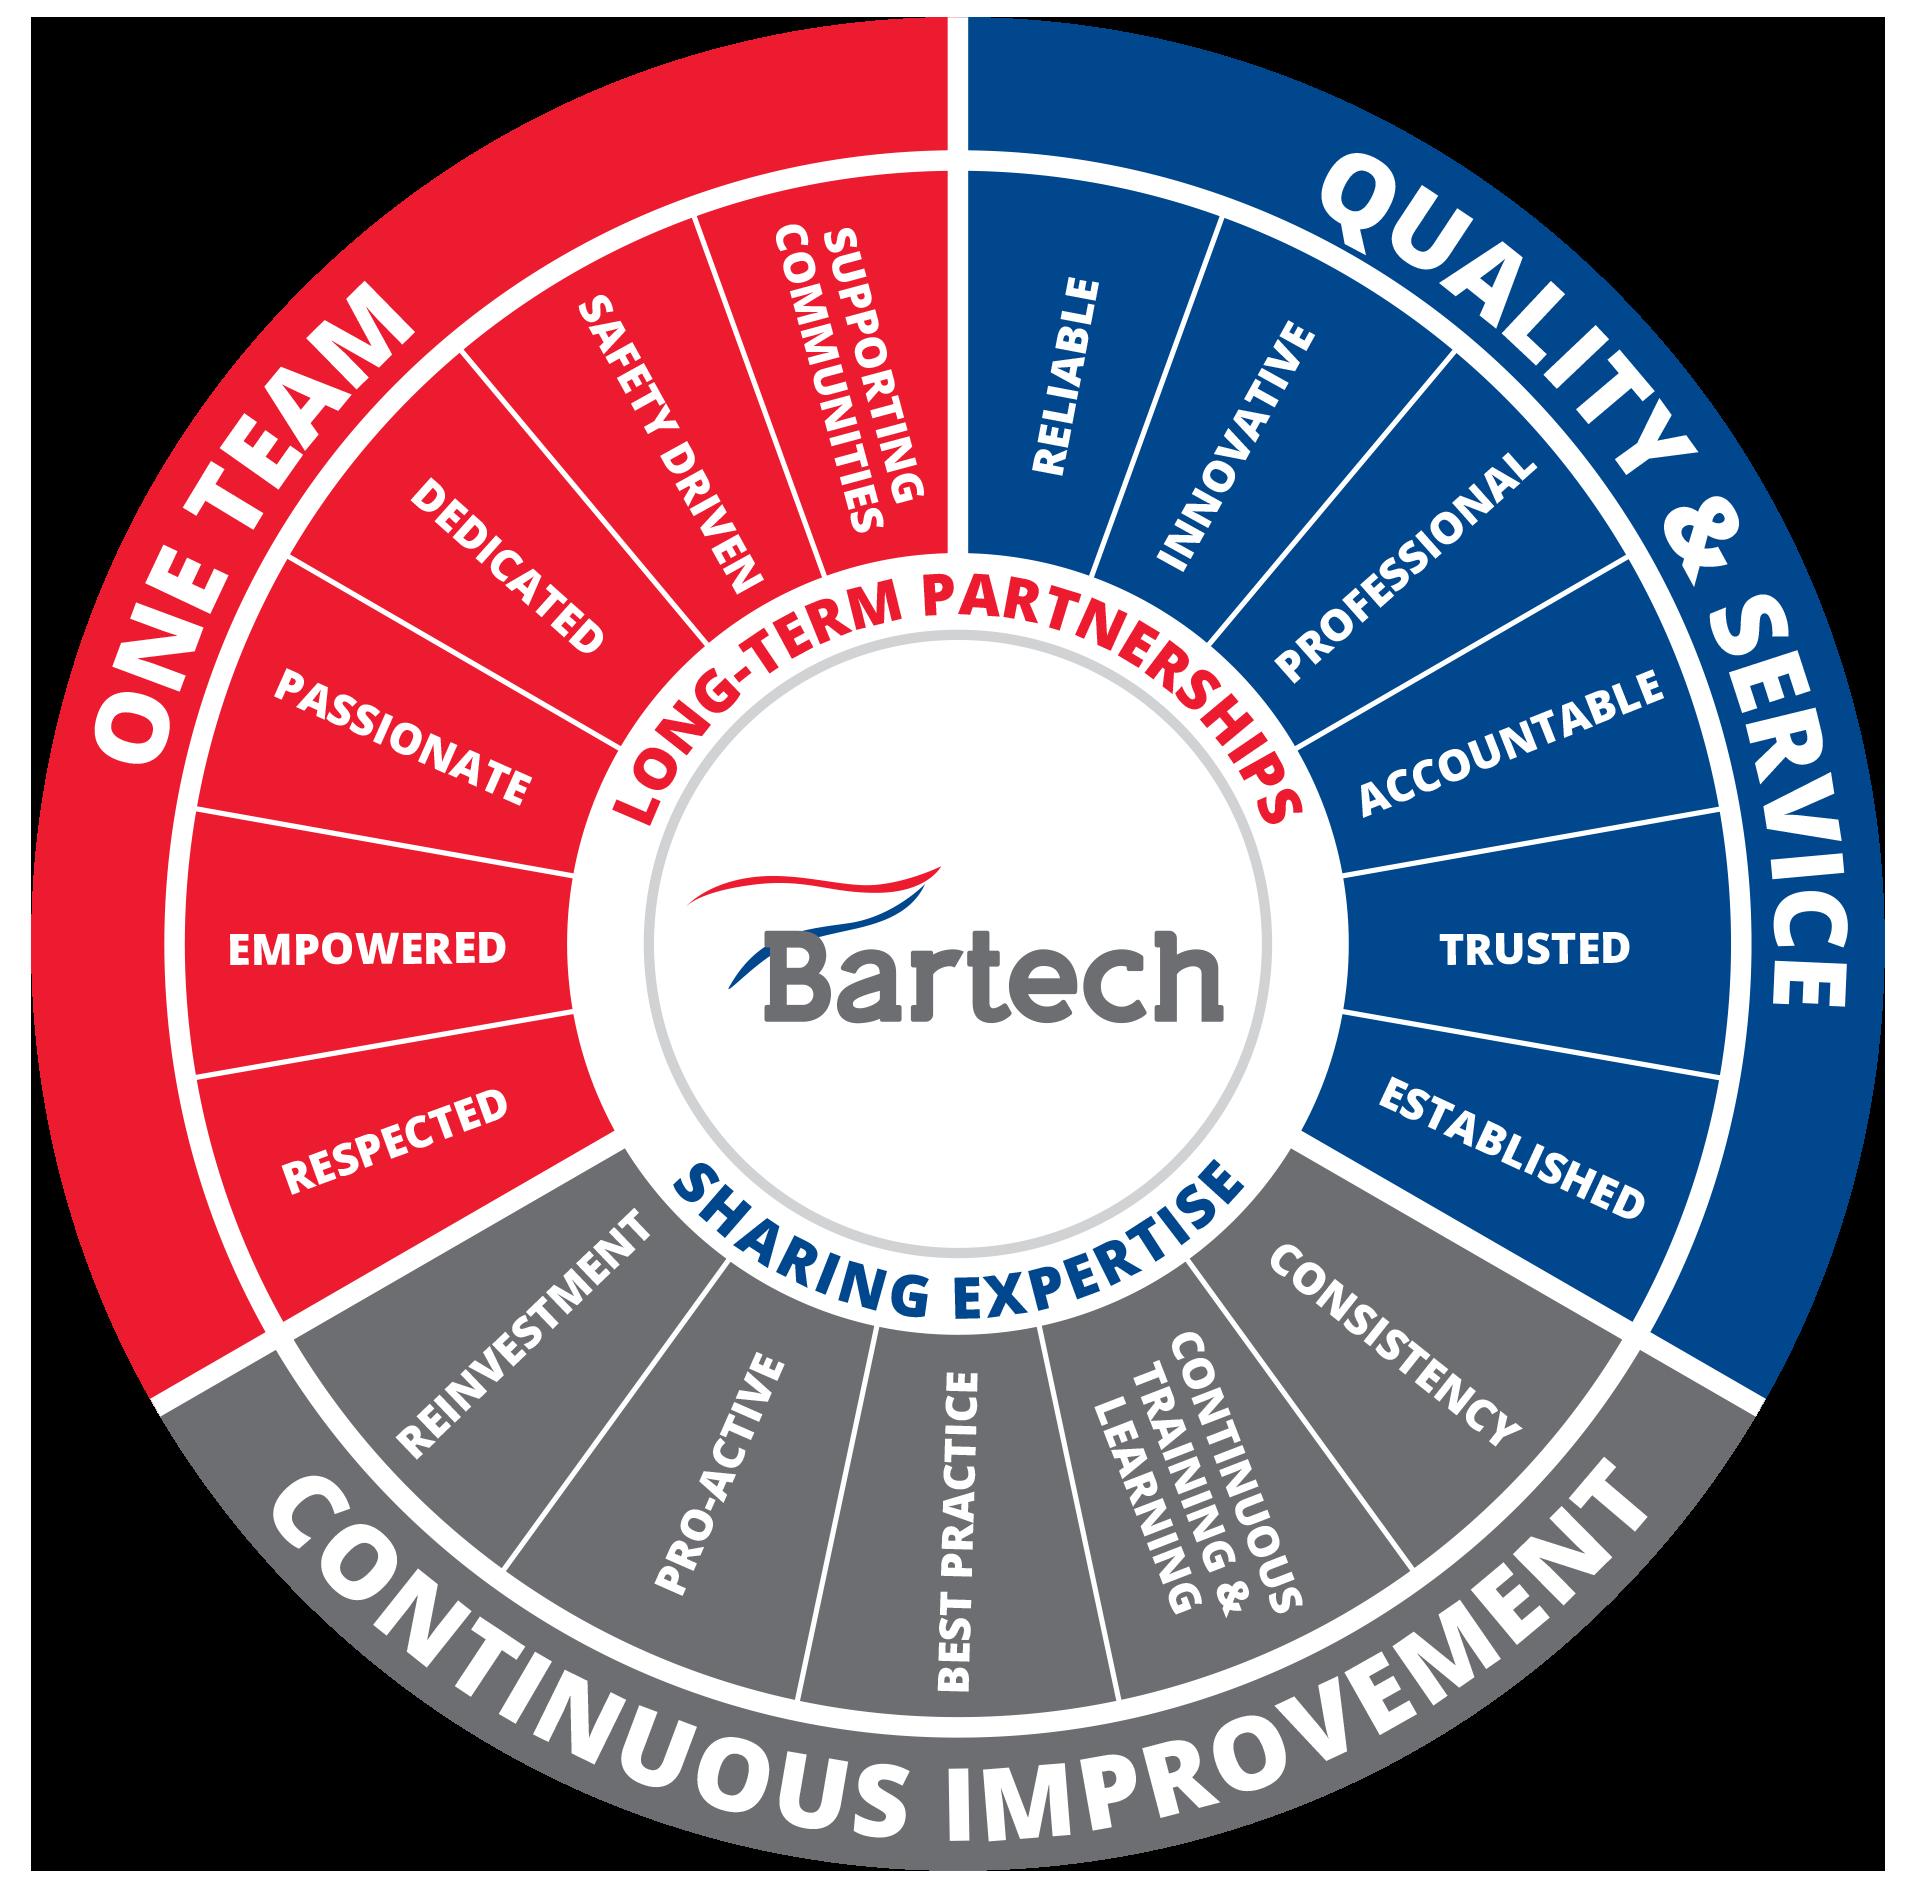 Bartech value steering wheel